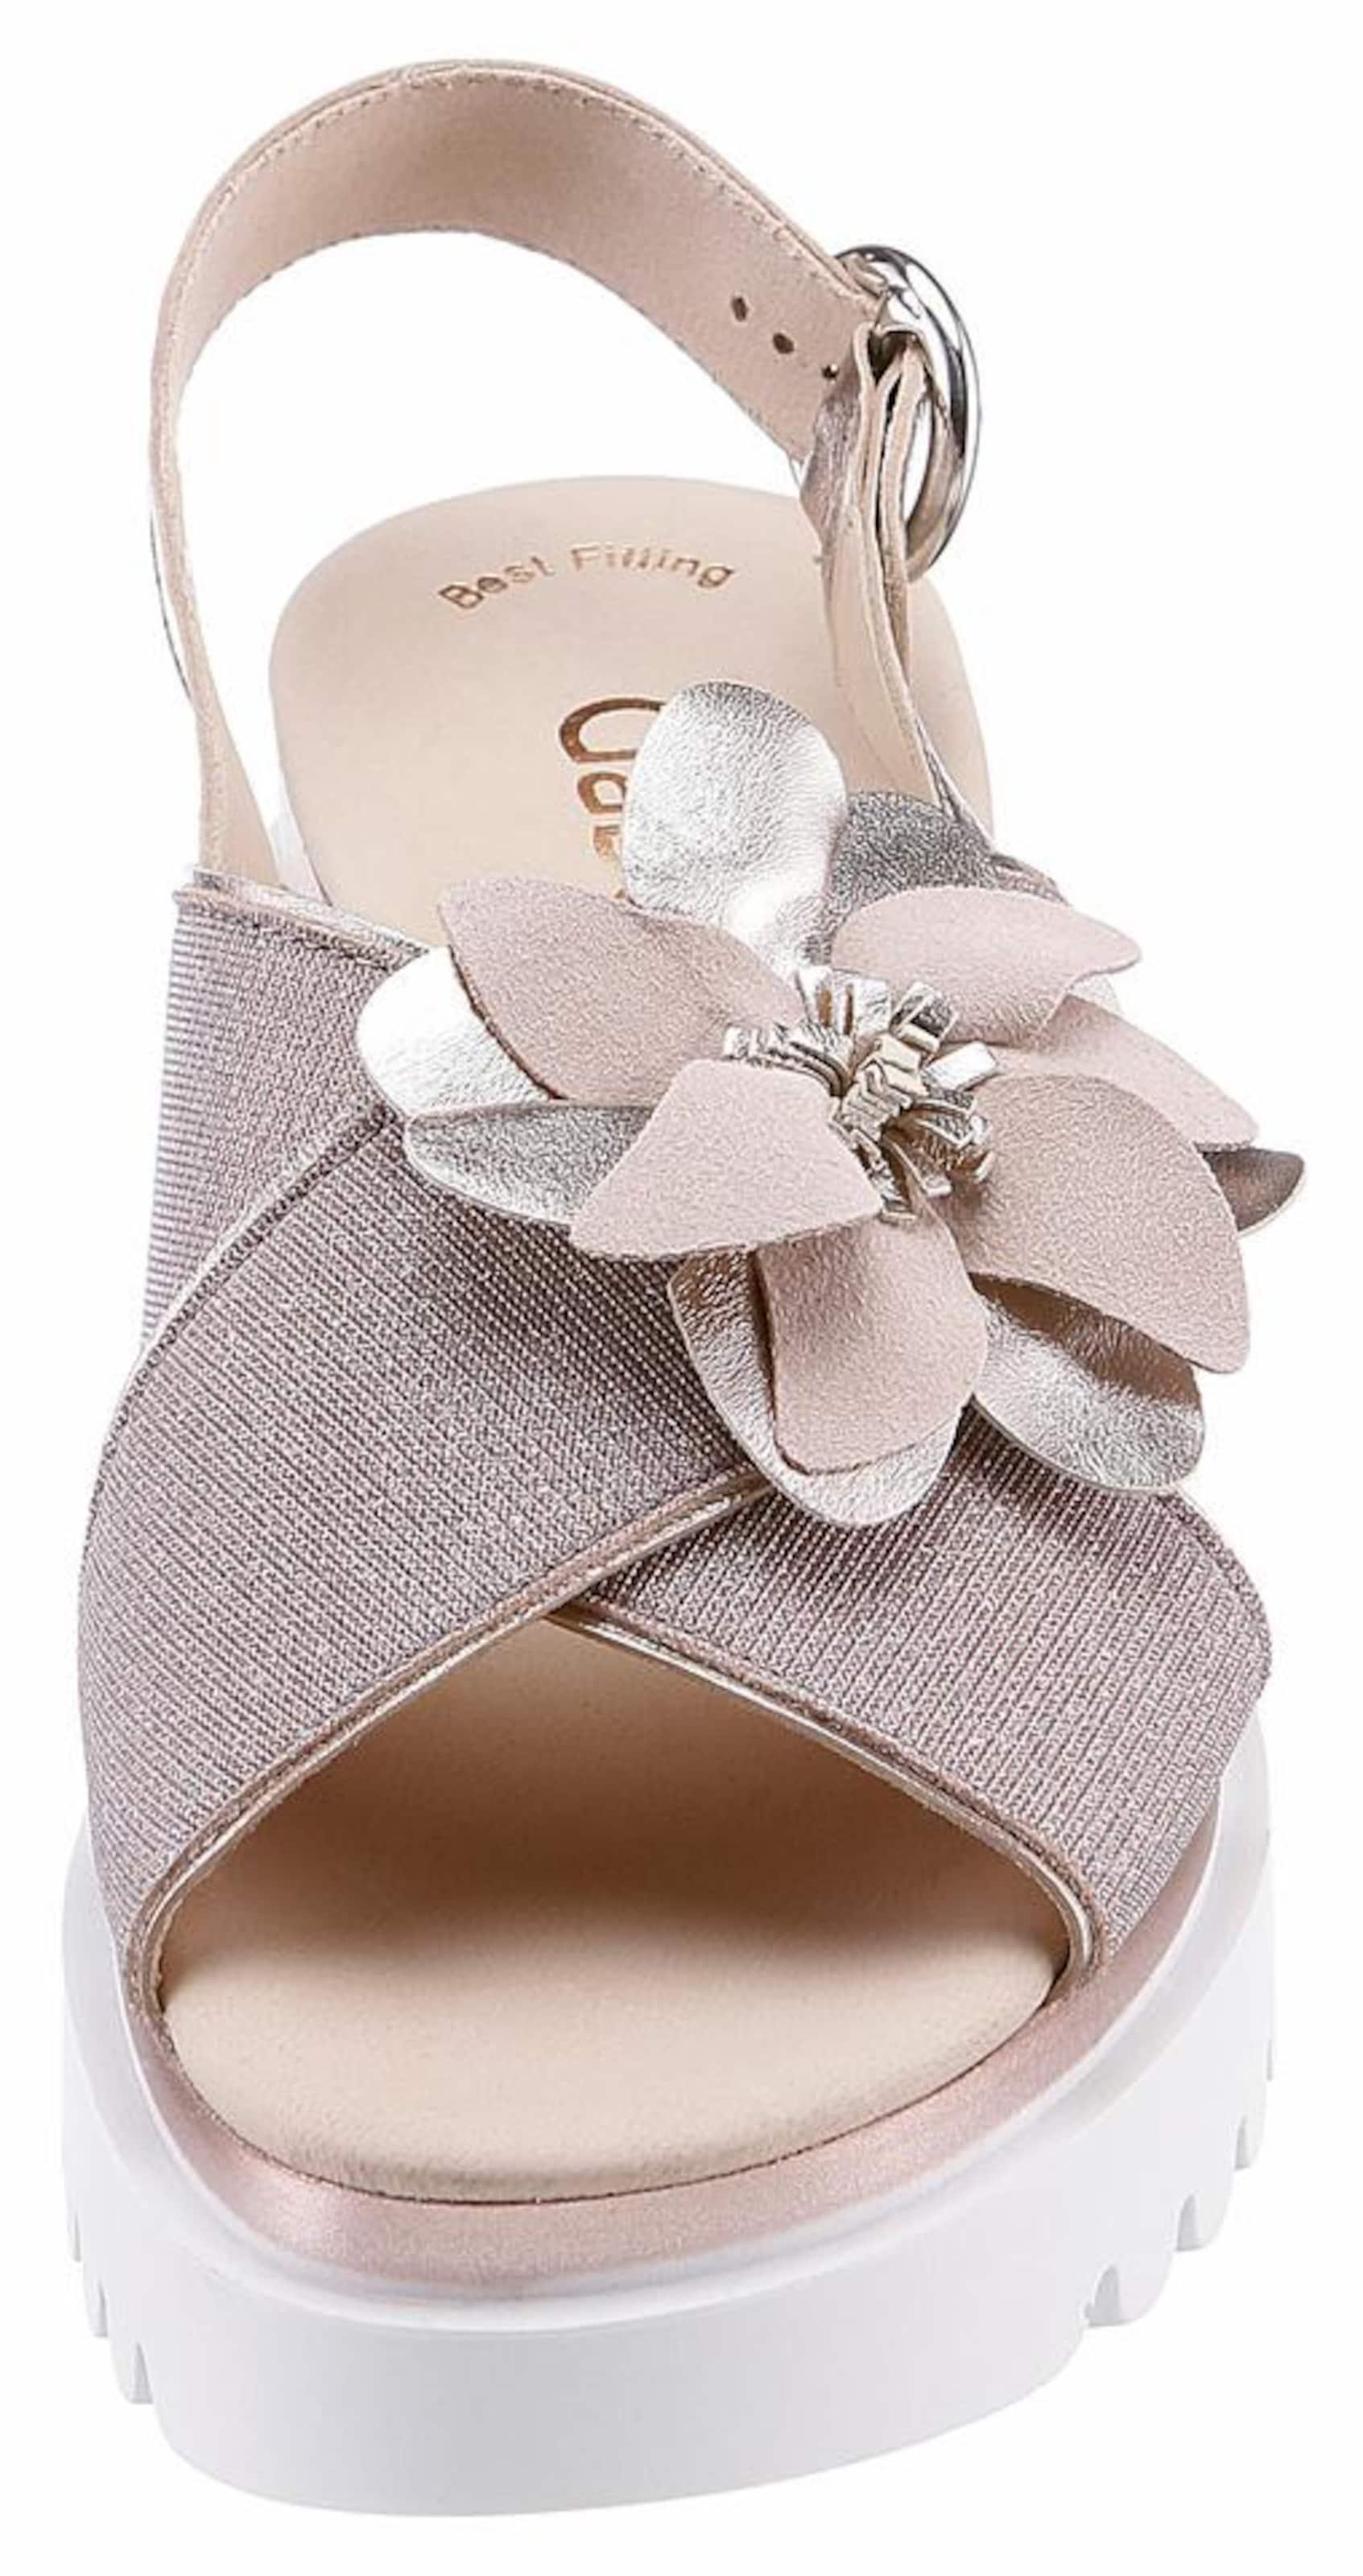 Sandalette CremeRosegold Gabor In Silber Weiß nN0wv8Om